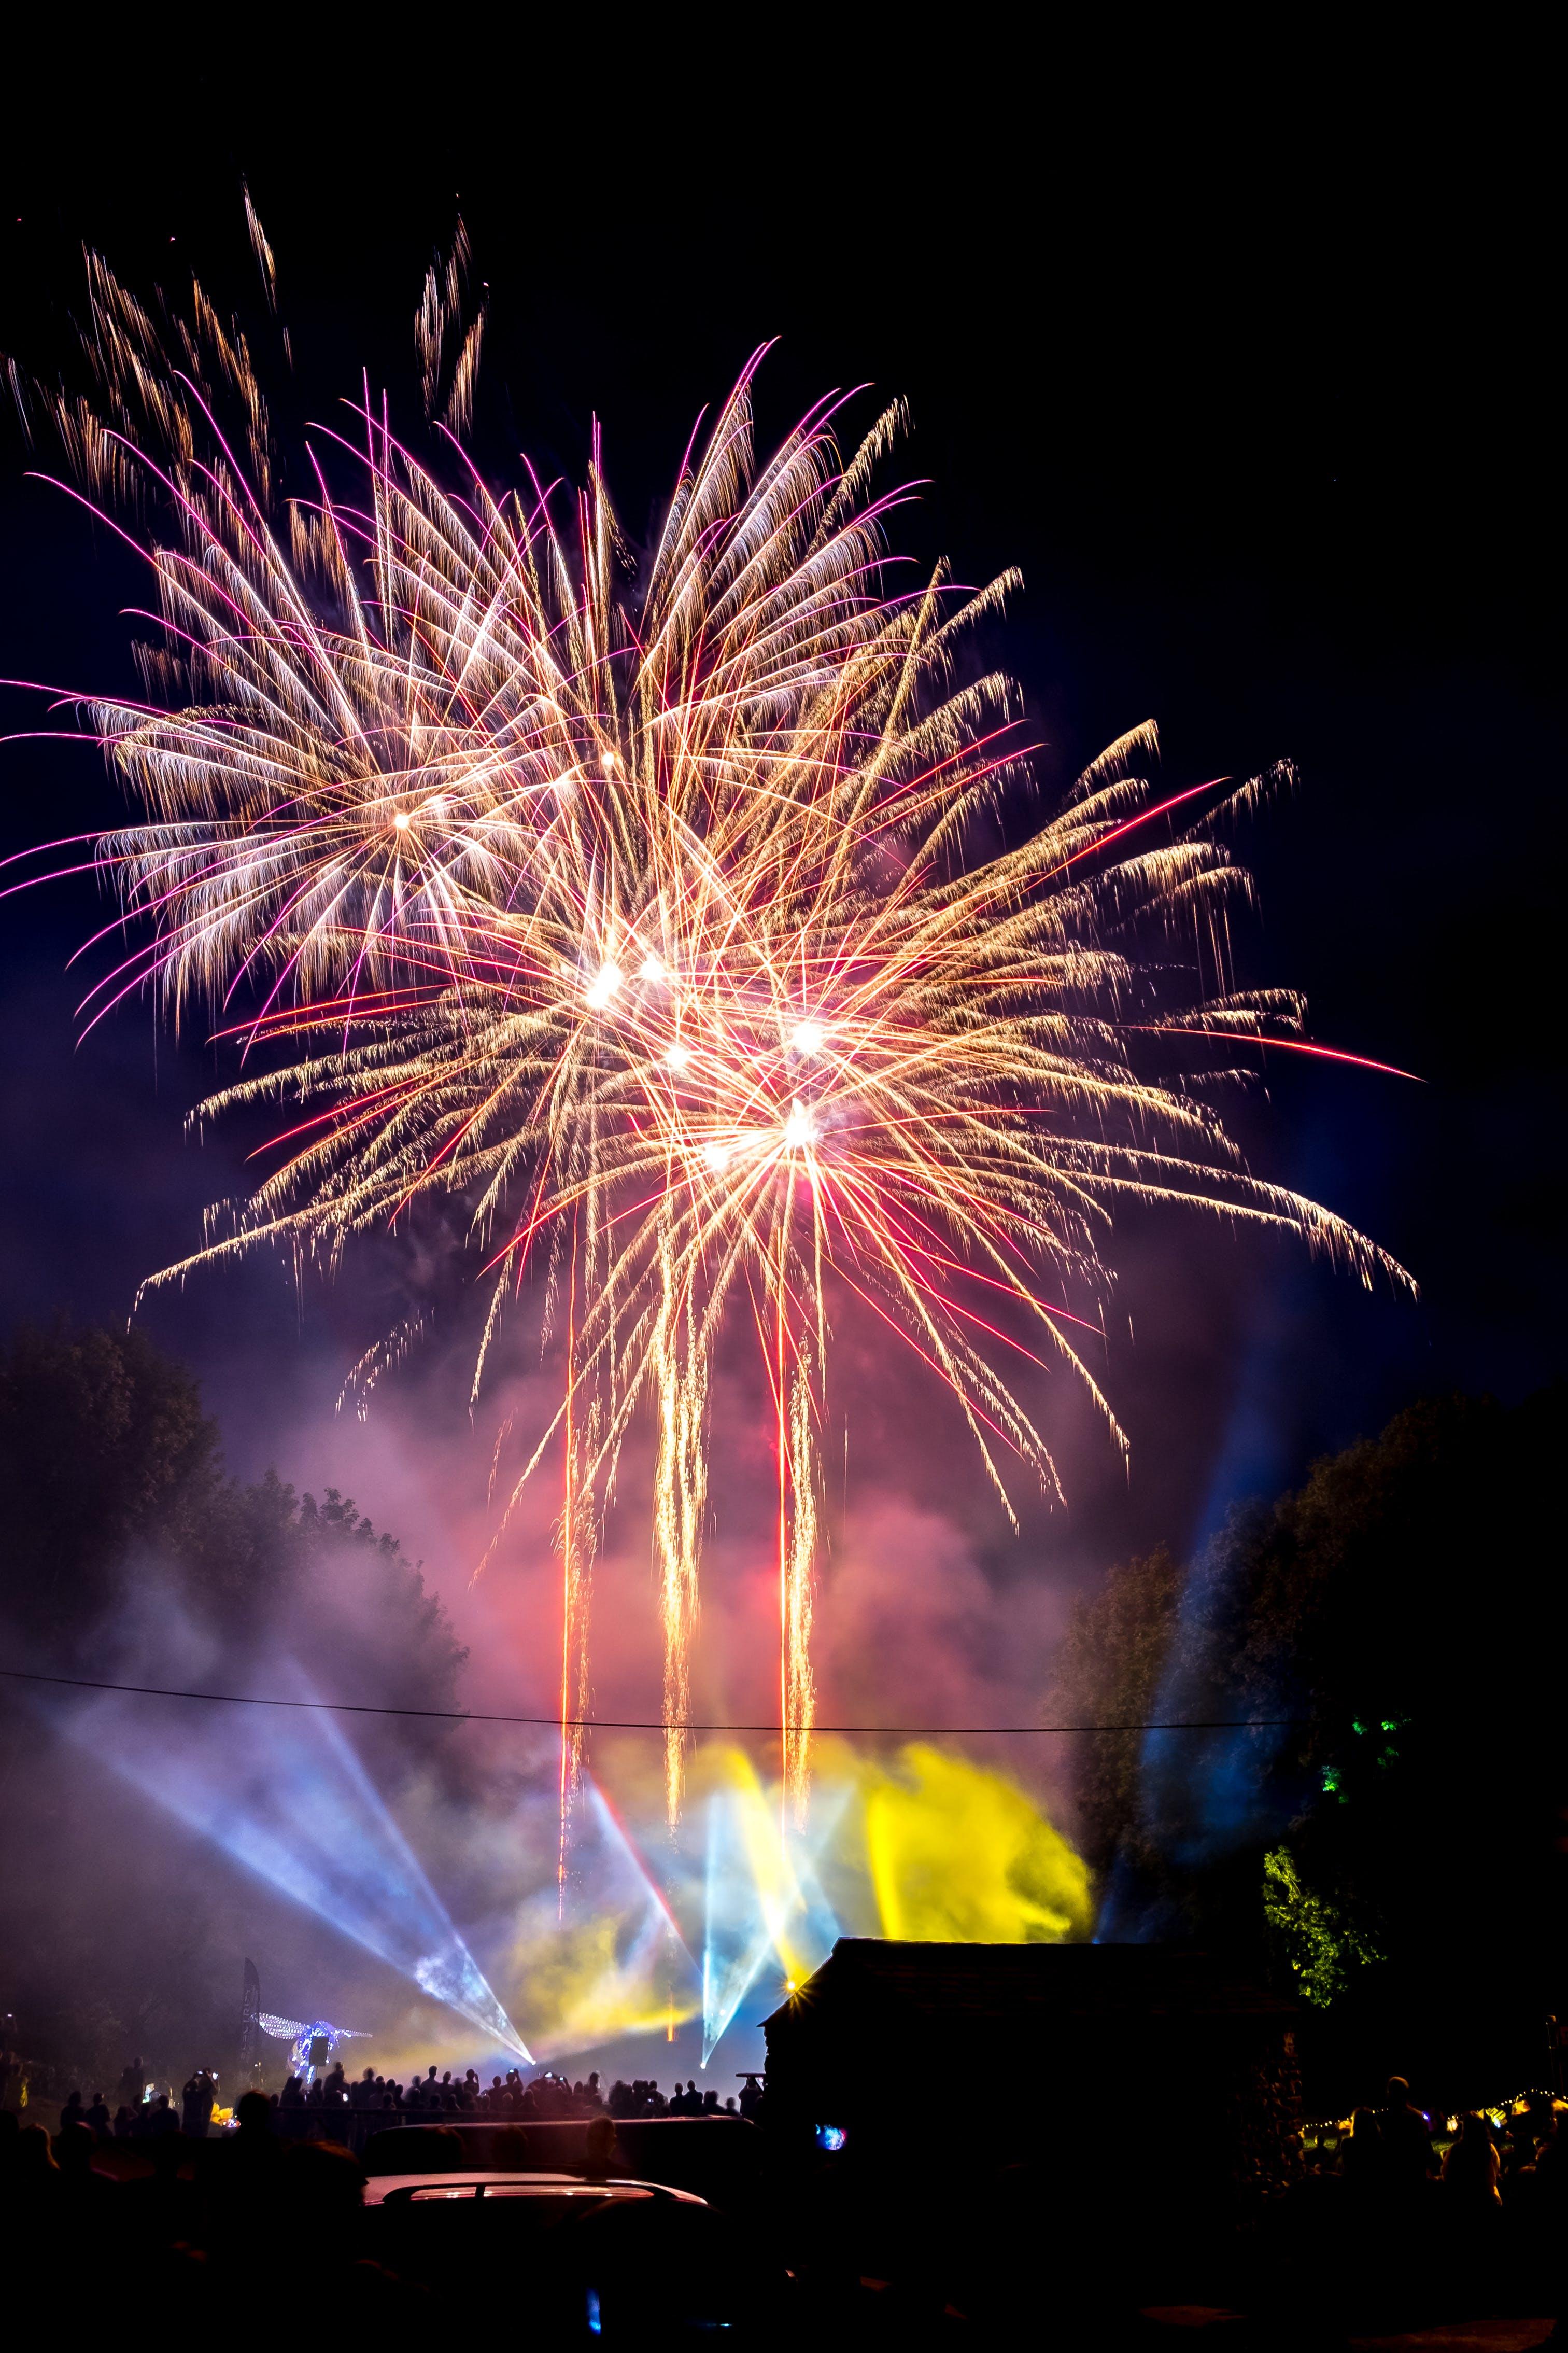 Kostenloses Stock Foto zu beleuchtung, festival, party, explosion